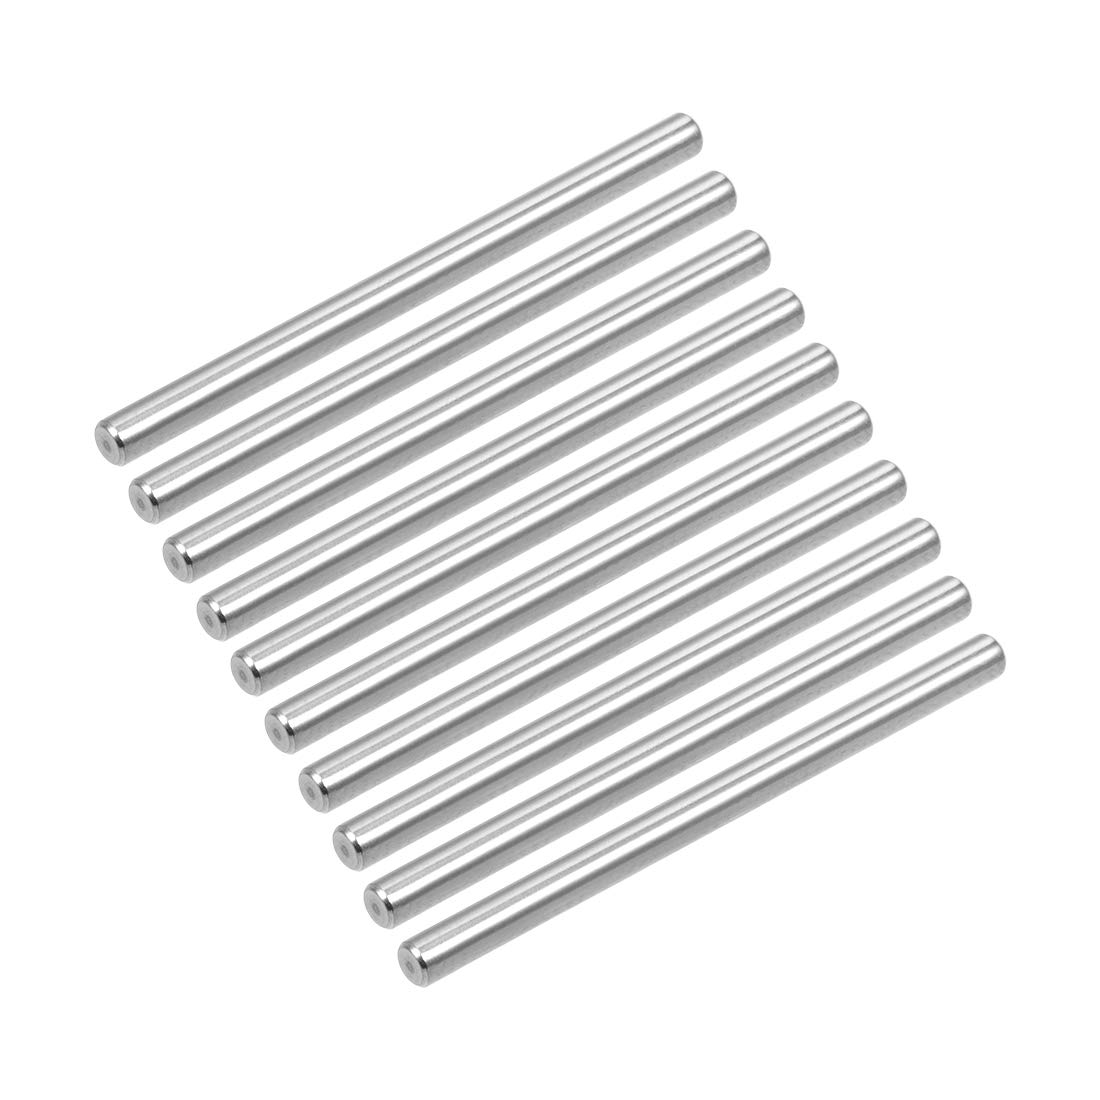 10Pcs 4mm x 50mm Dowel Pin 304 Stainless Steel Shelf Support Pin Fasten